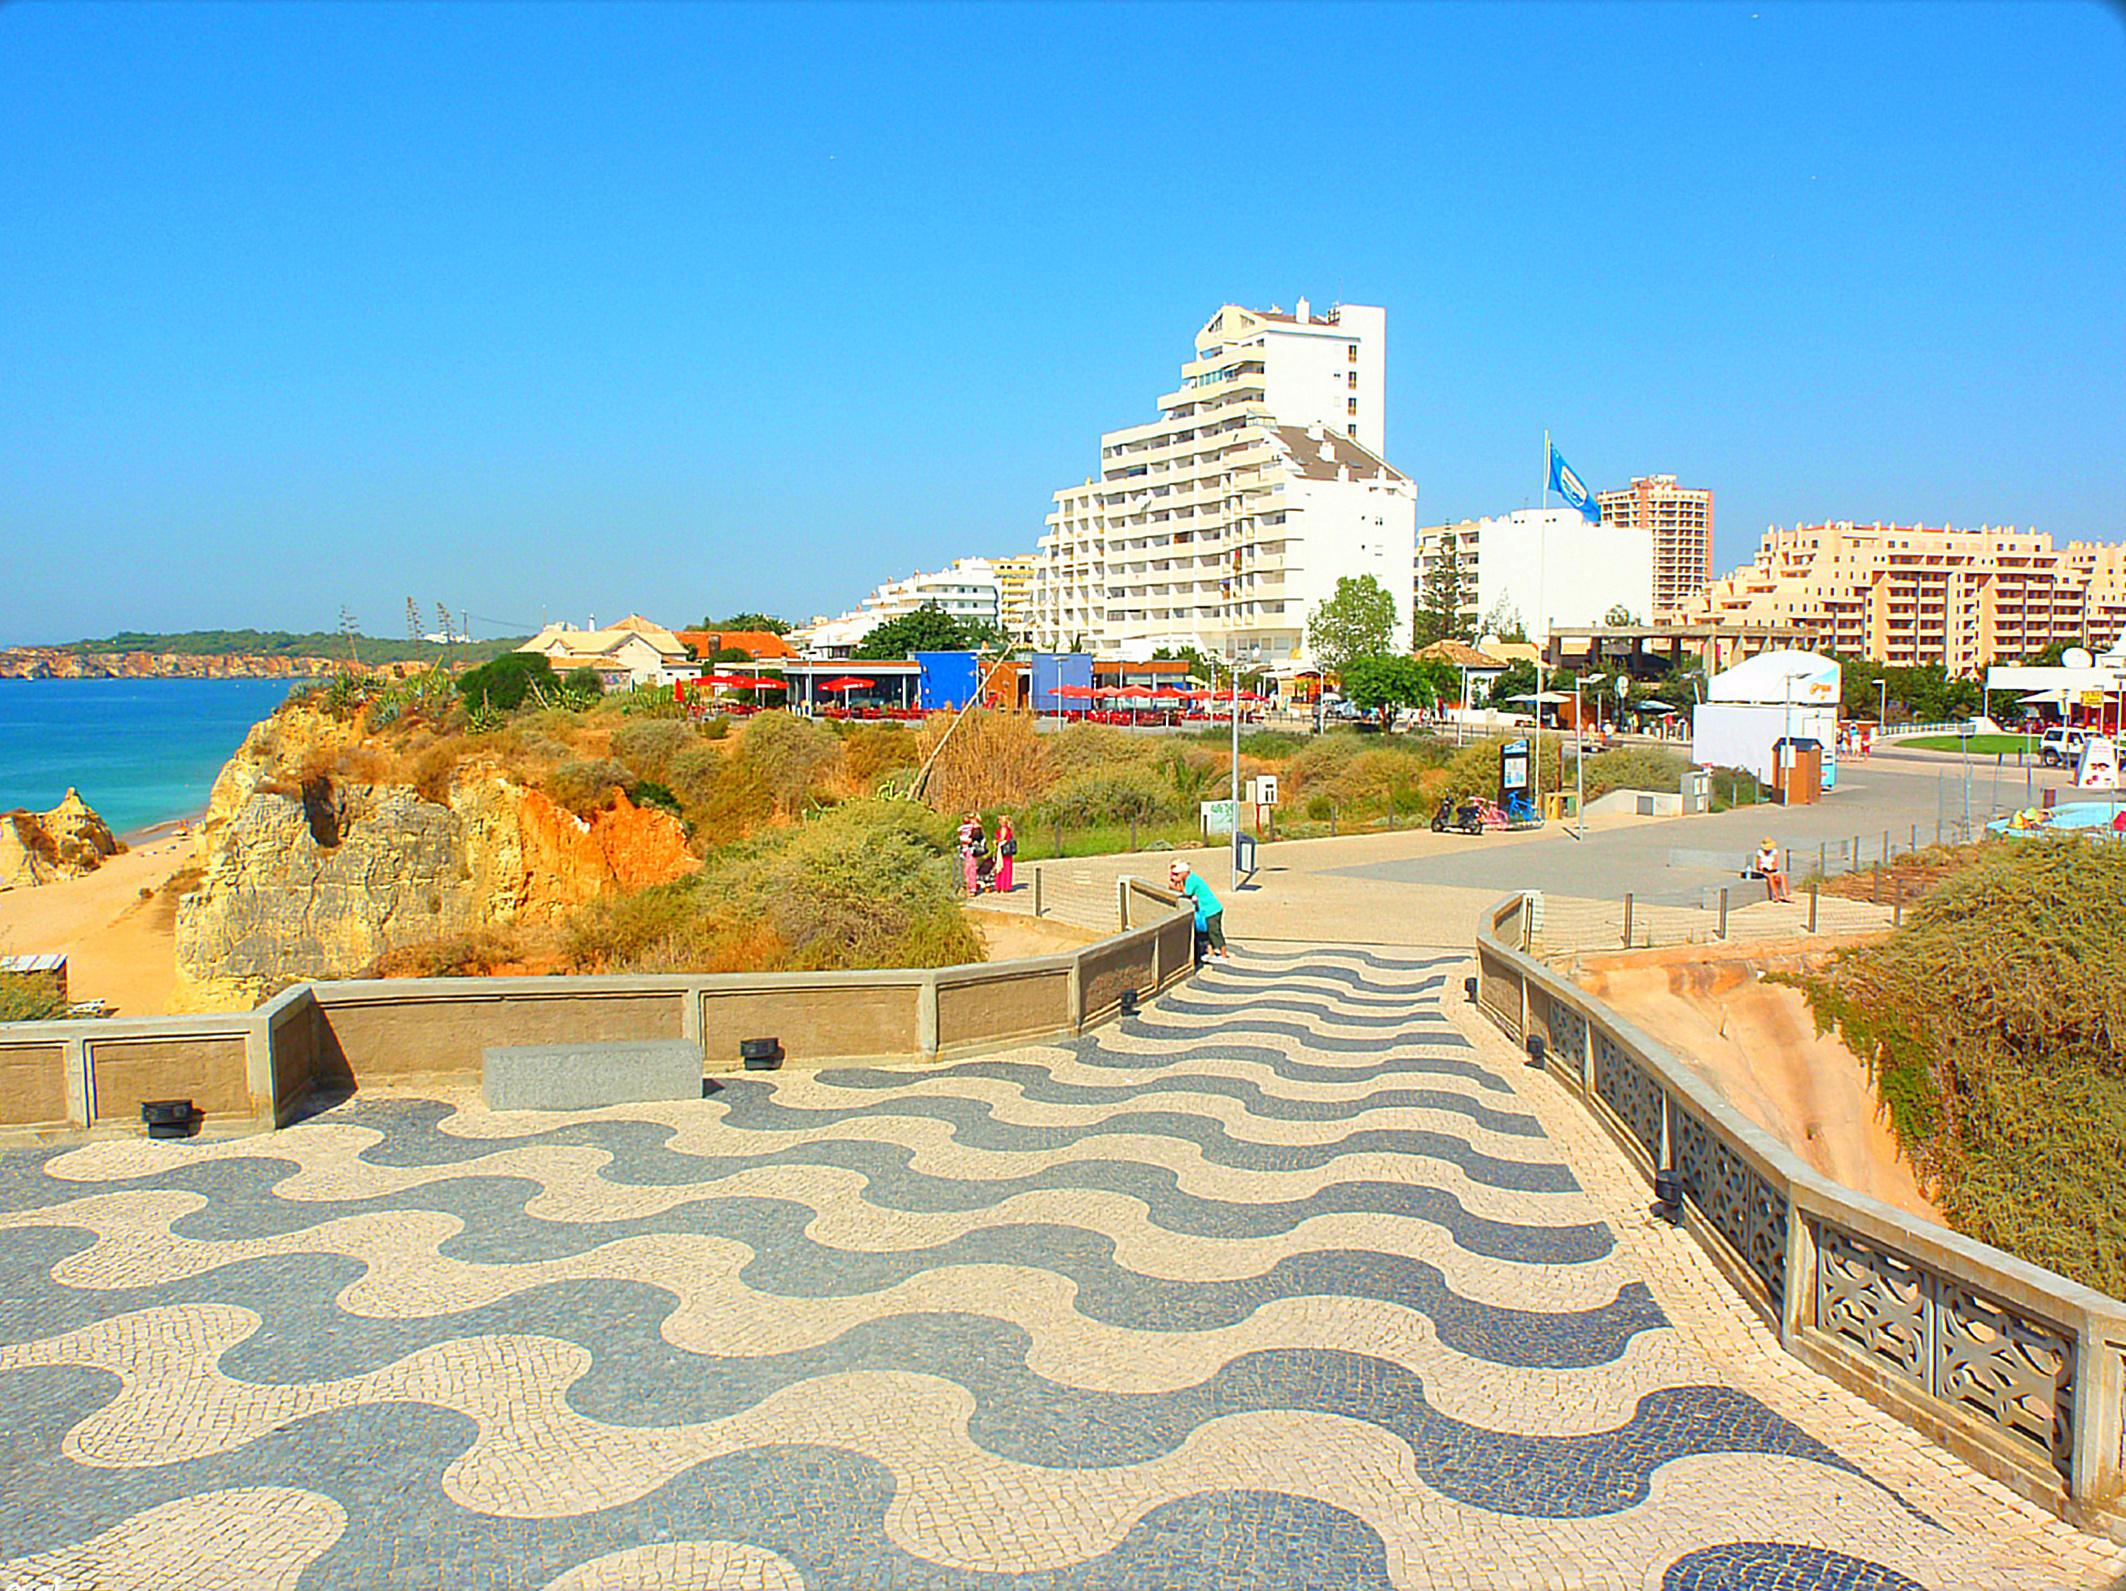 портимао португалия фото